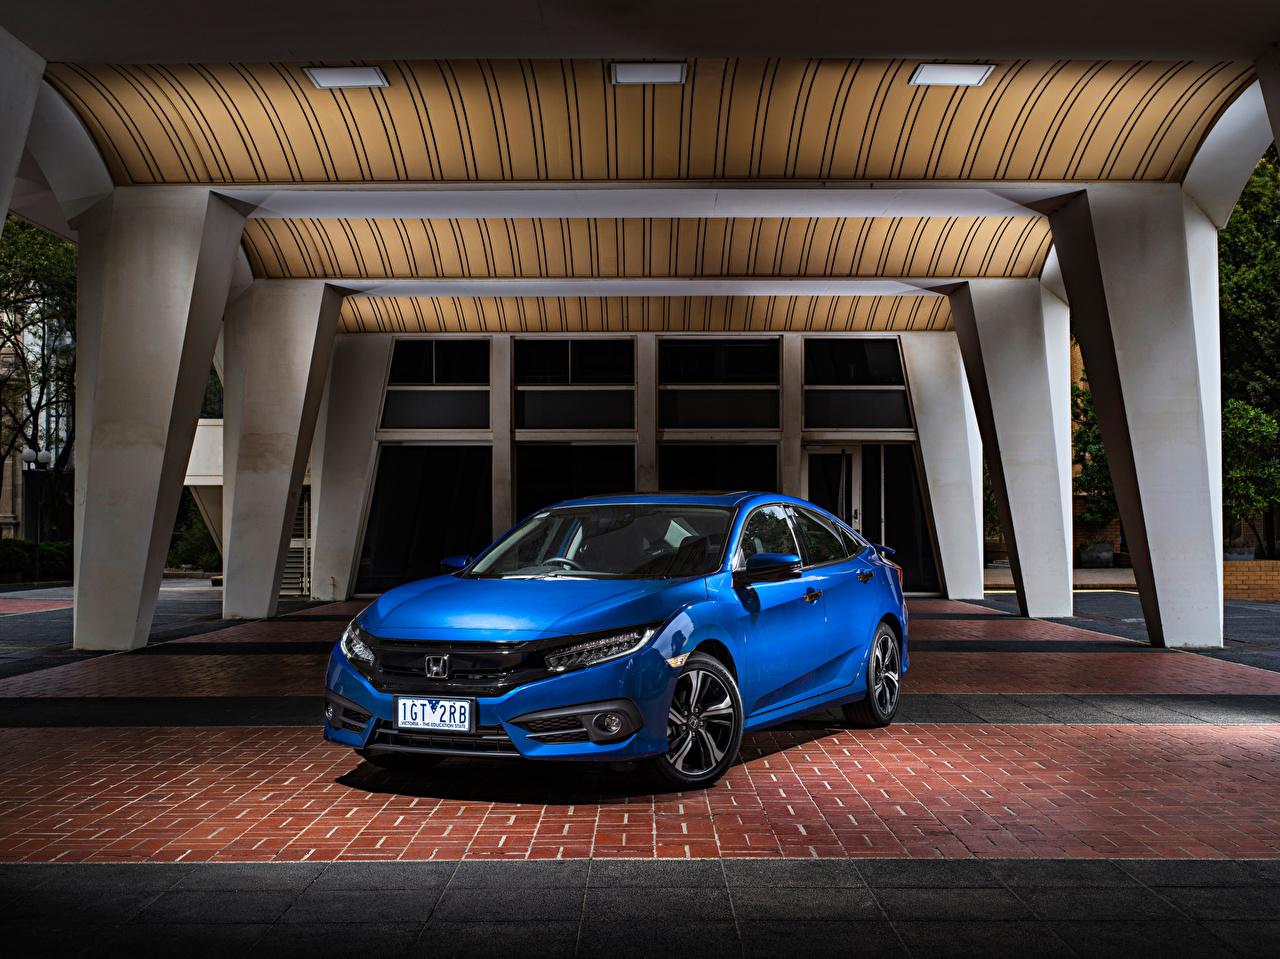 Картинки Хонда 2016-17 Civic Sedan RS Синий Авто Honda Машины Автомобили